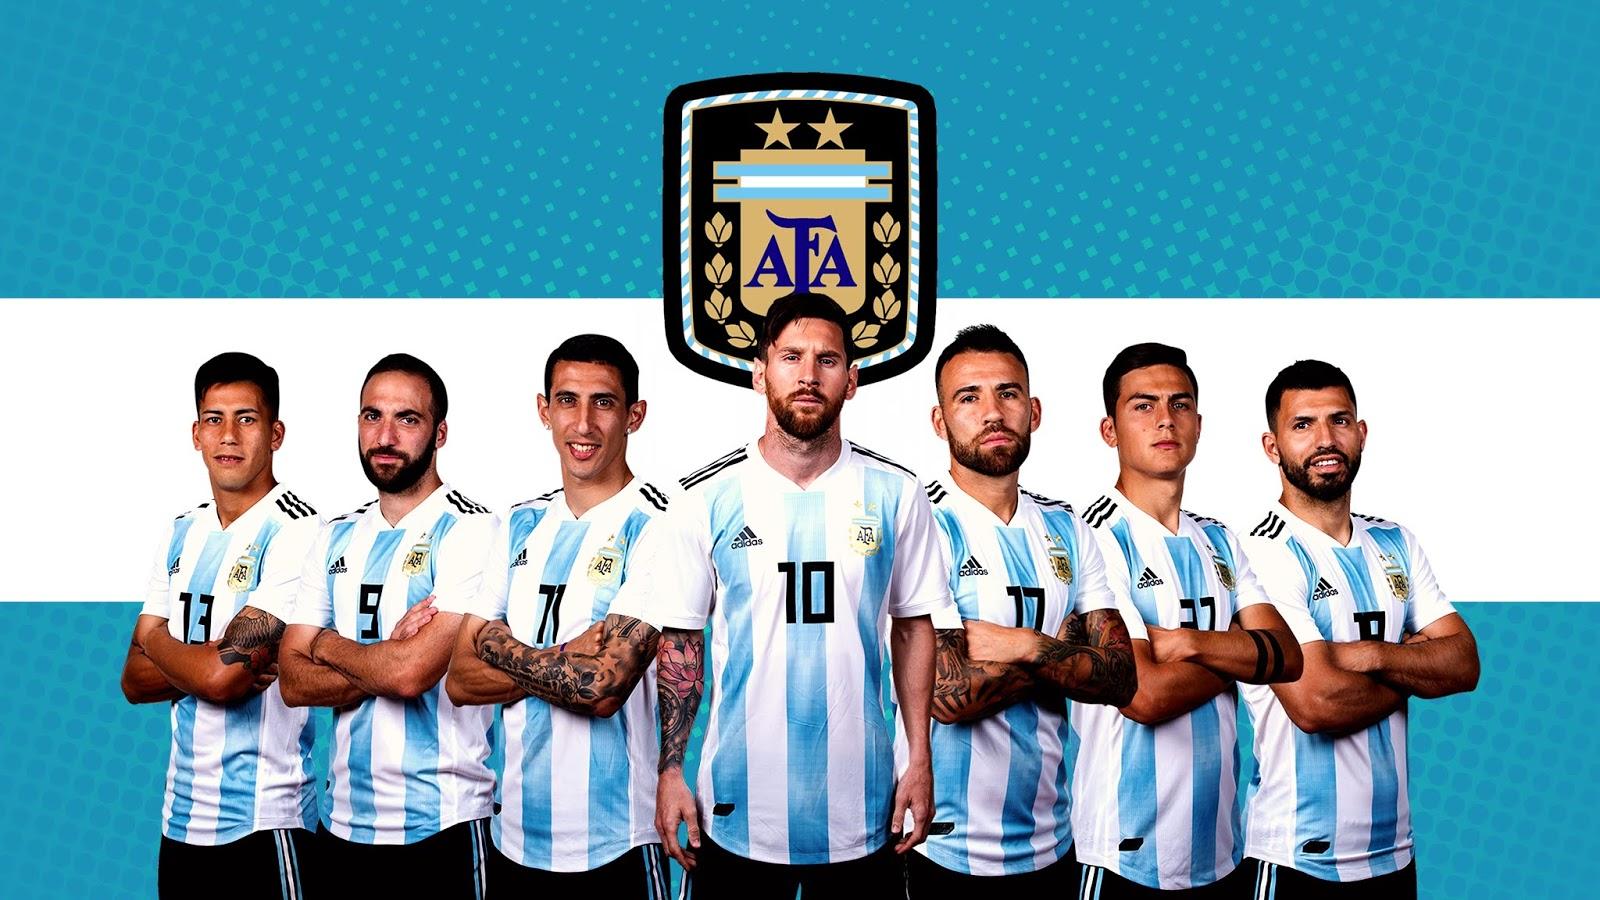 Argentina Football Association, Lionel Messi, 4K, 5K, Sports